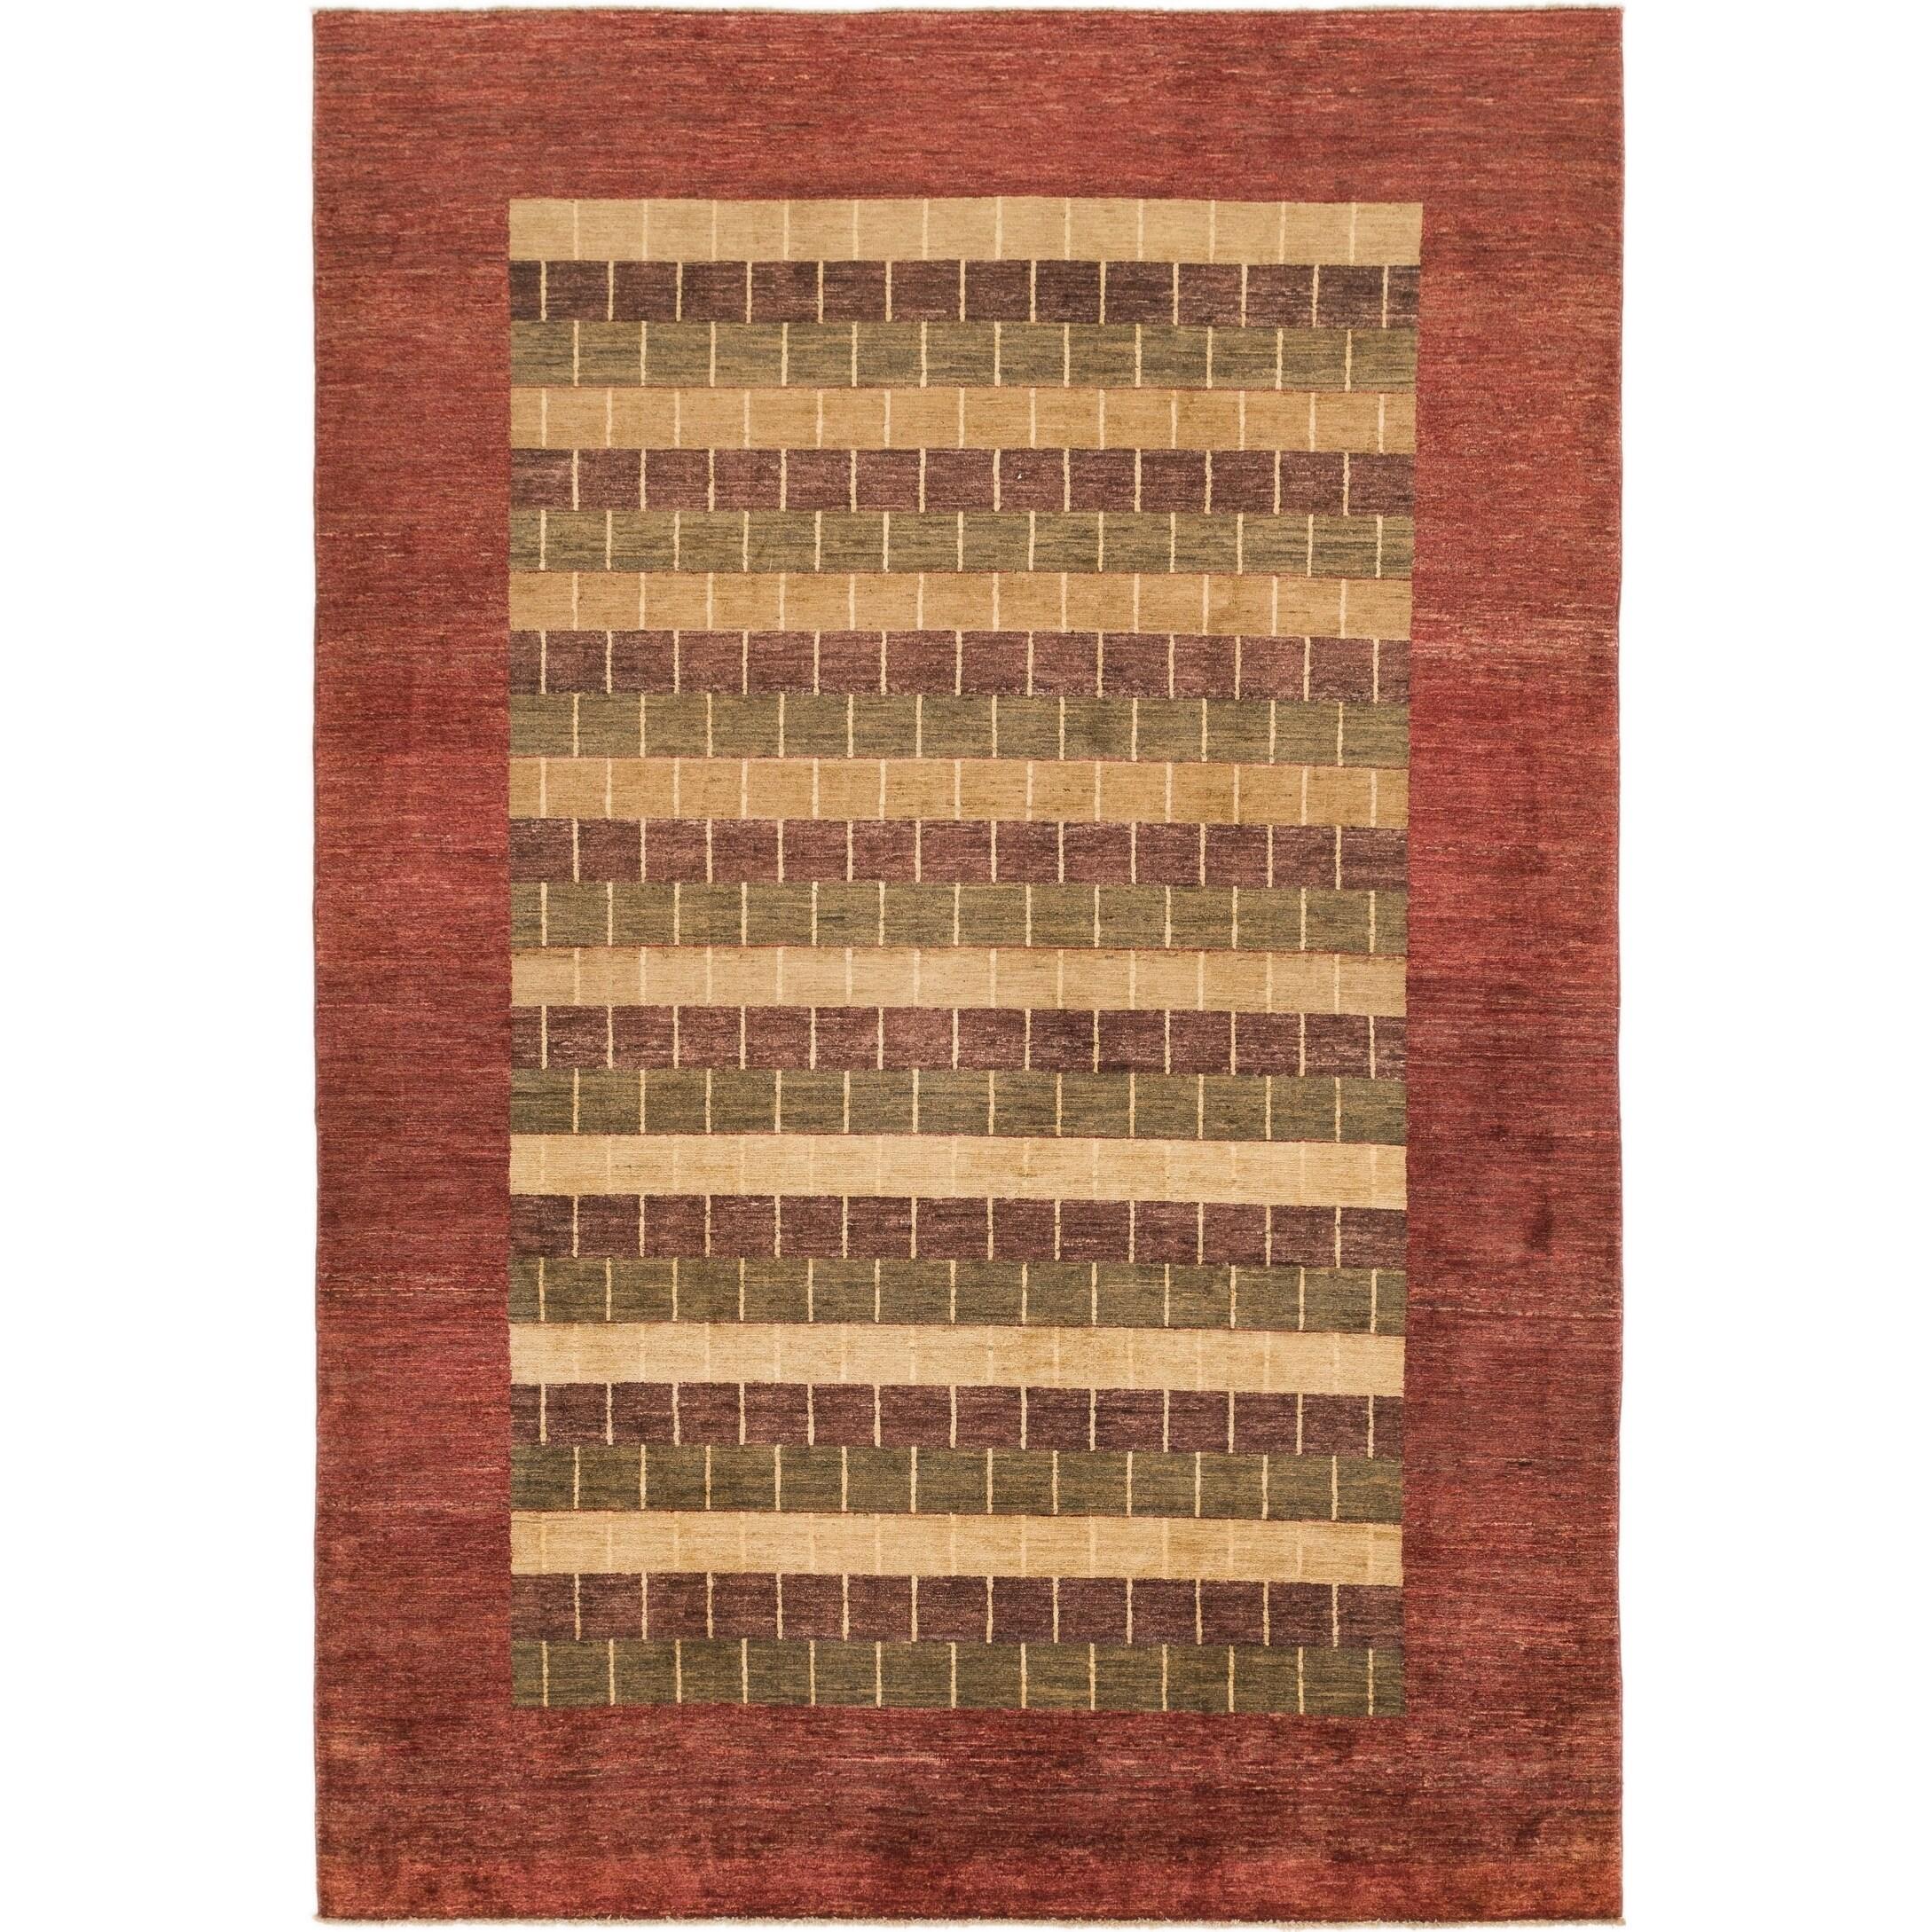 Hand Knotted Kashkuli Gabbeh Wool Area Rug - 6 6 x 9 6 (Multi - 6 6 x 9 6)